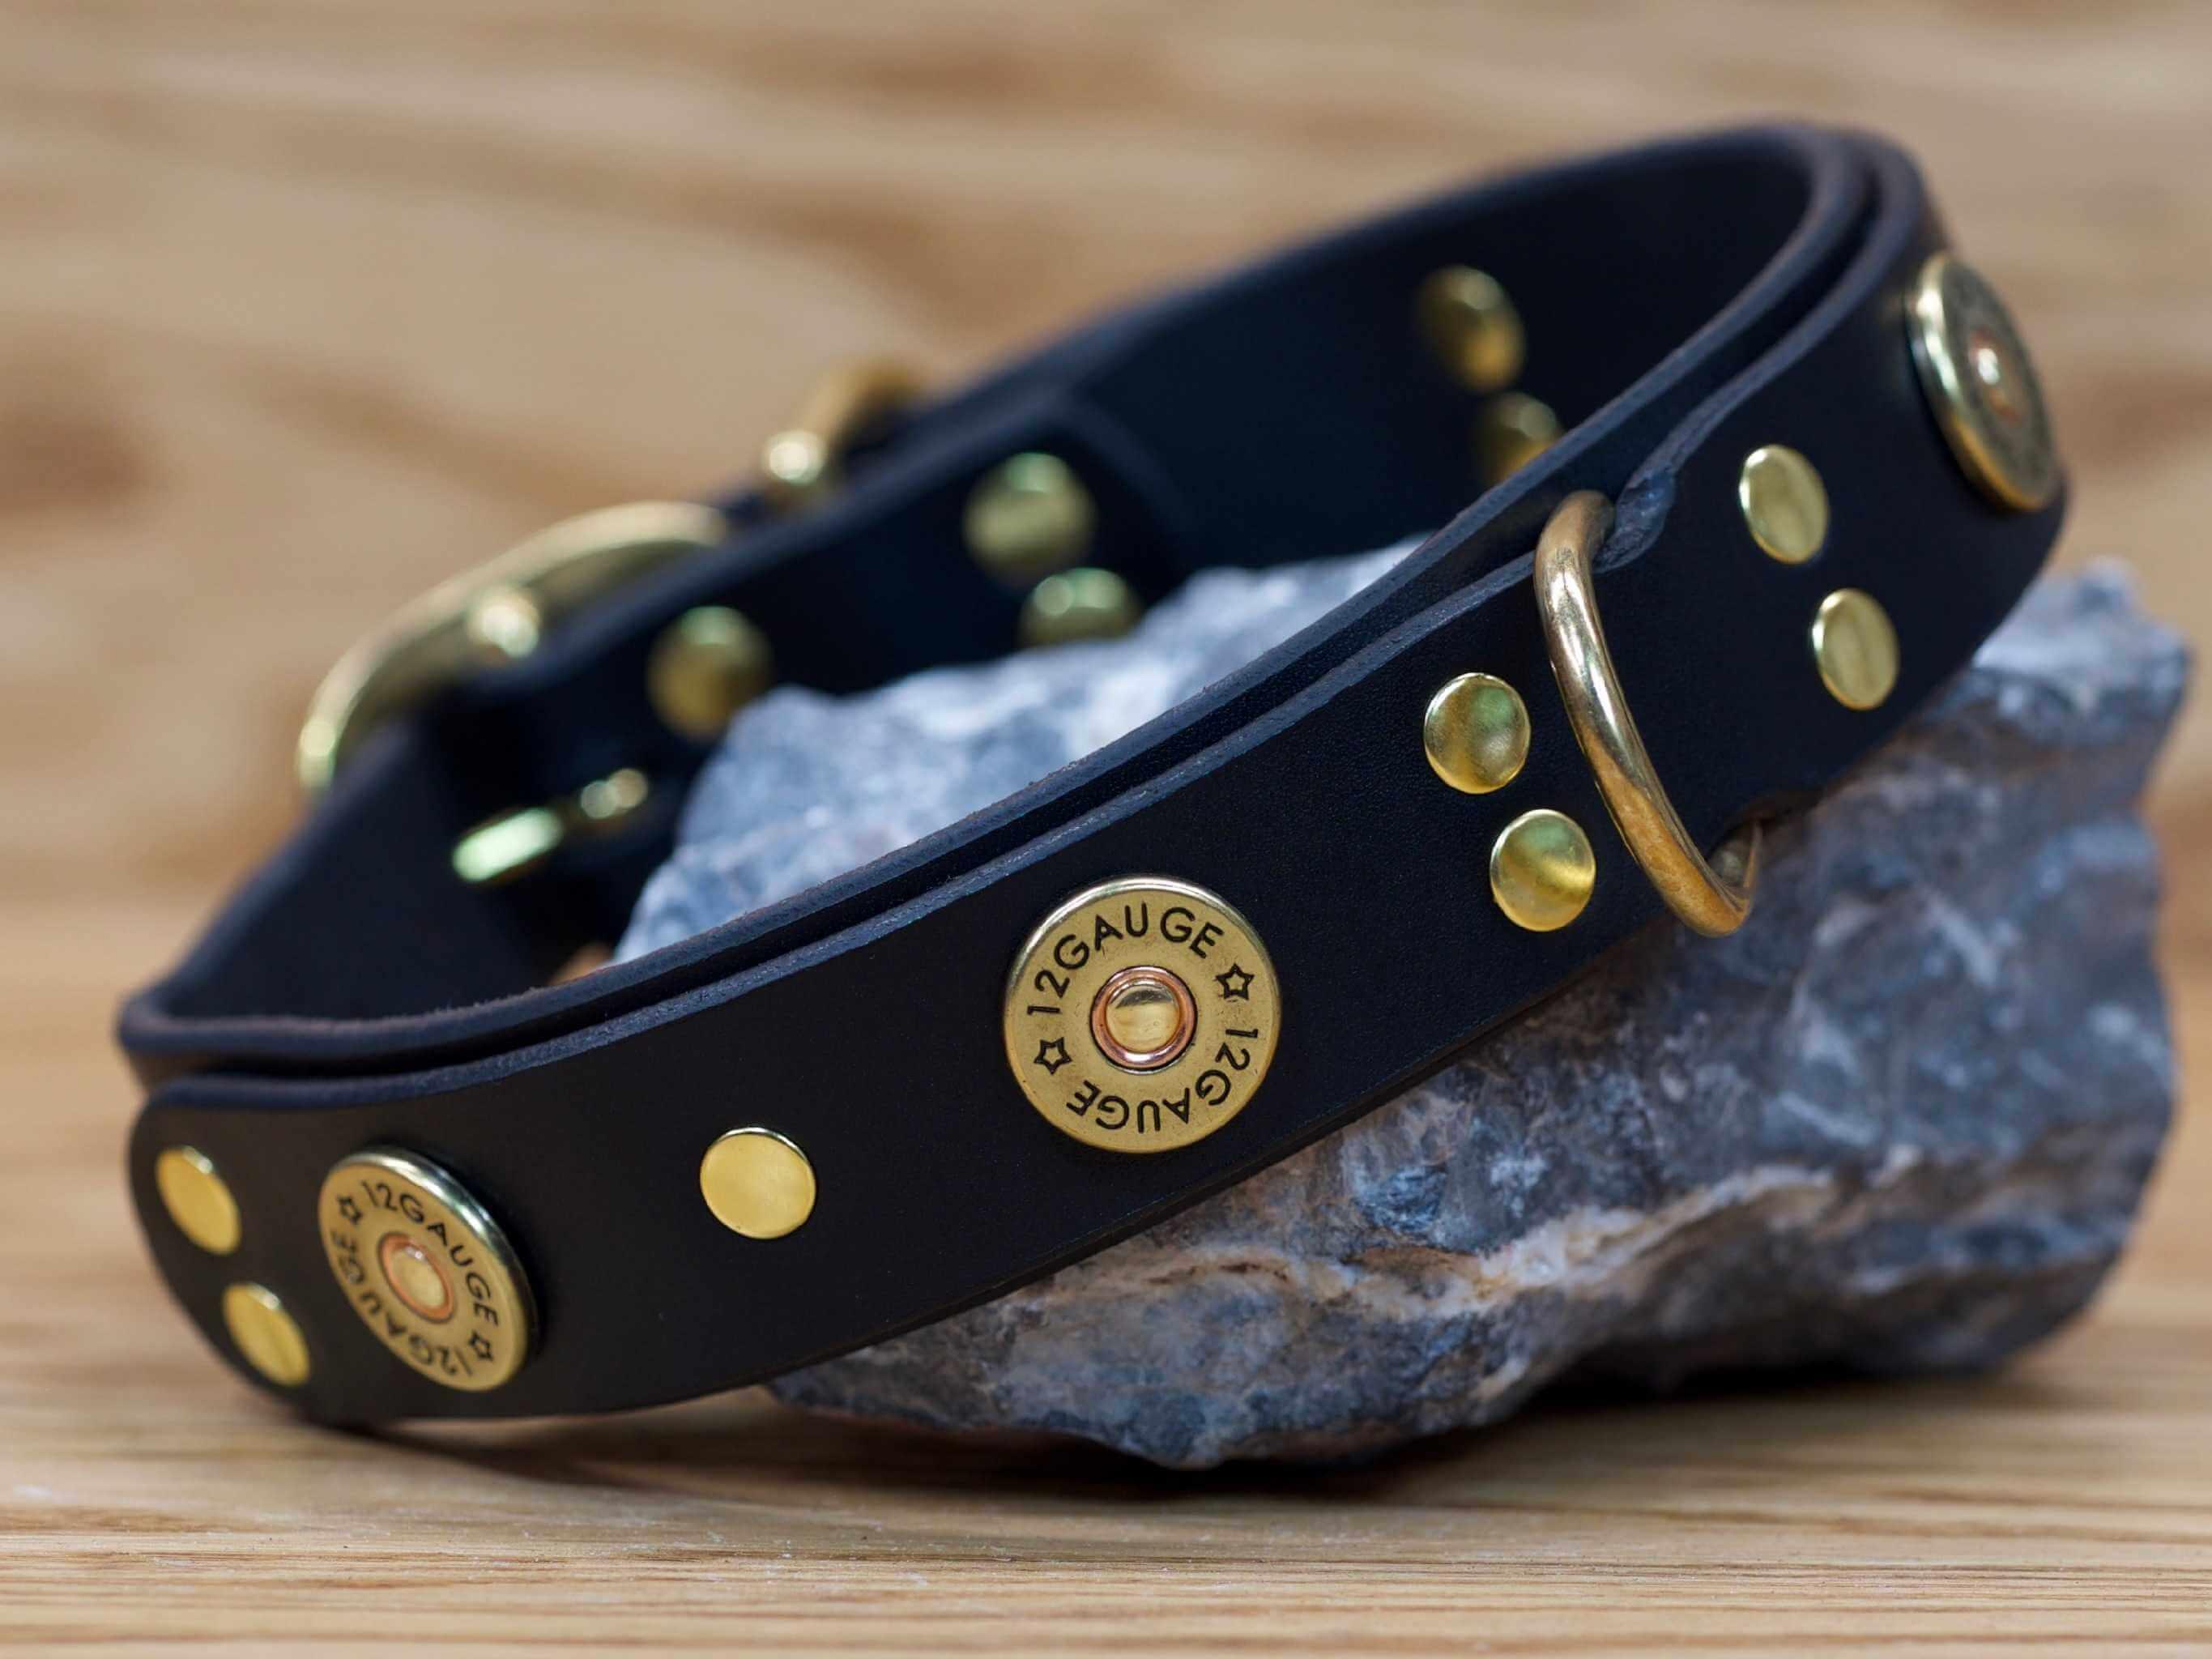 Shotgun dog collar shown in black leather